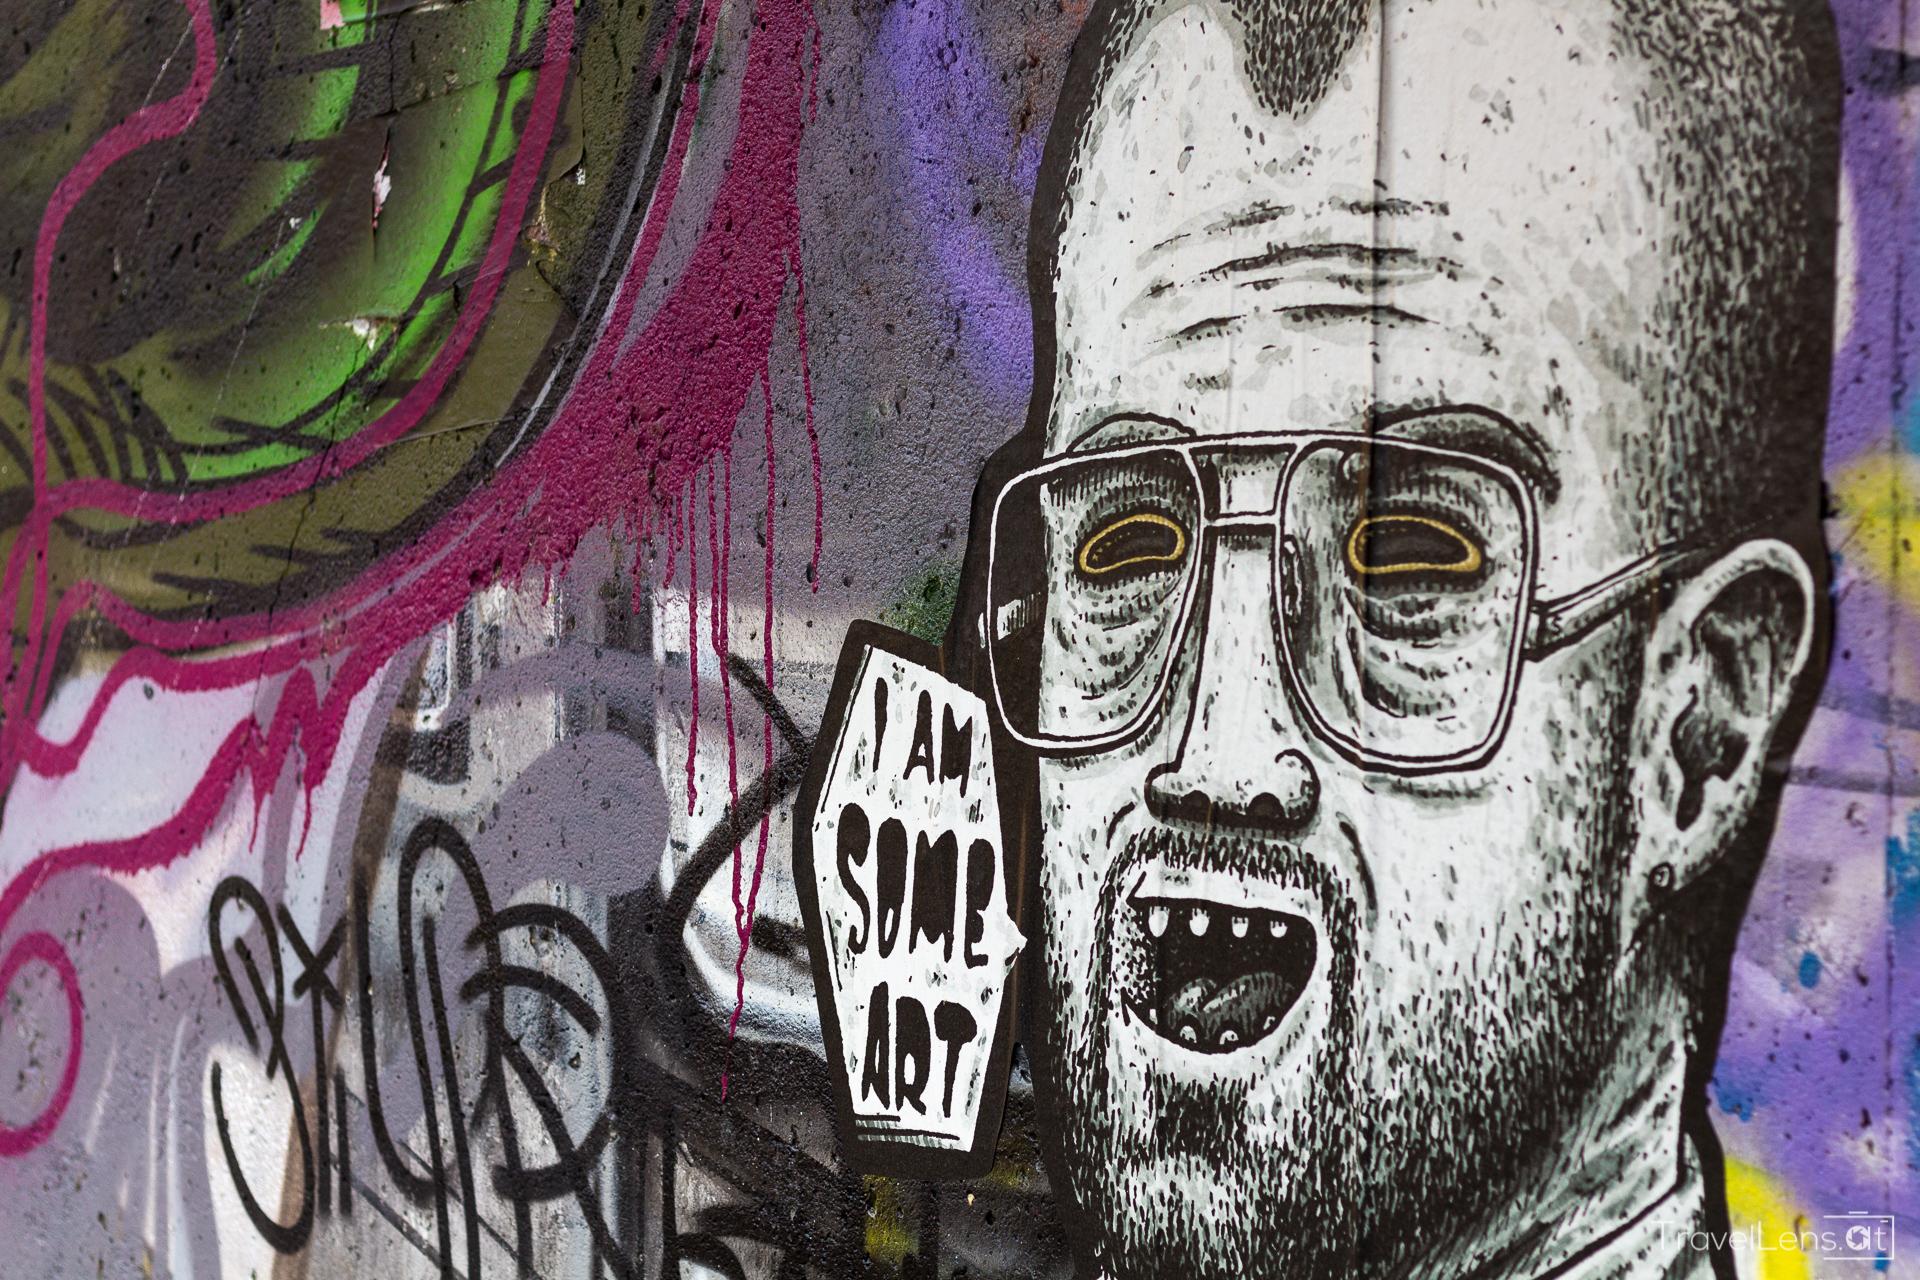 Wien Teil 2: Graffiti am Donaukanal